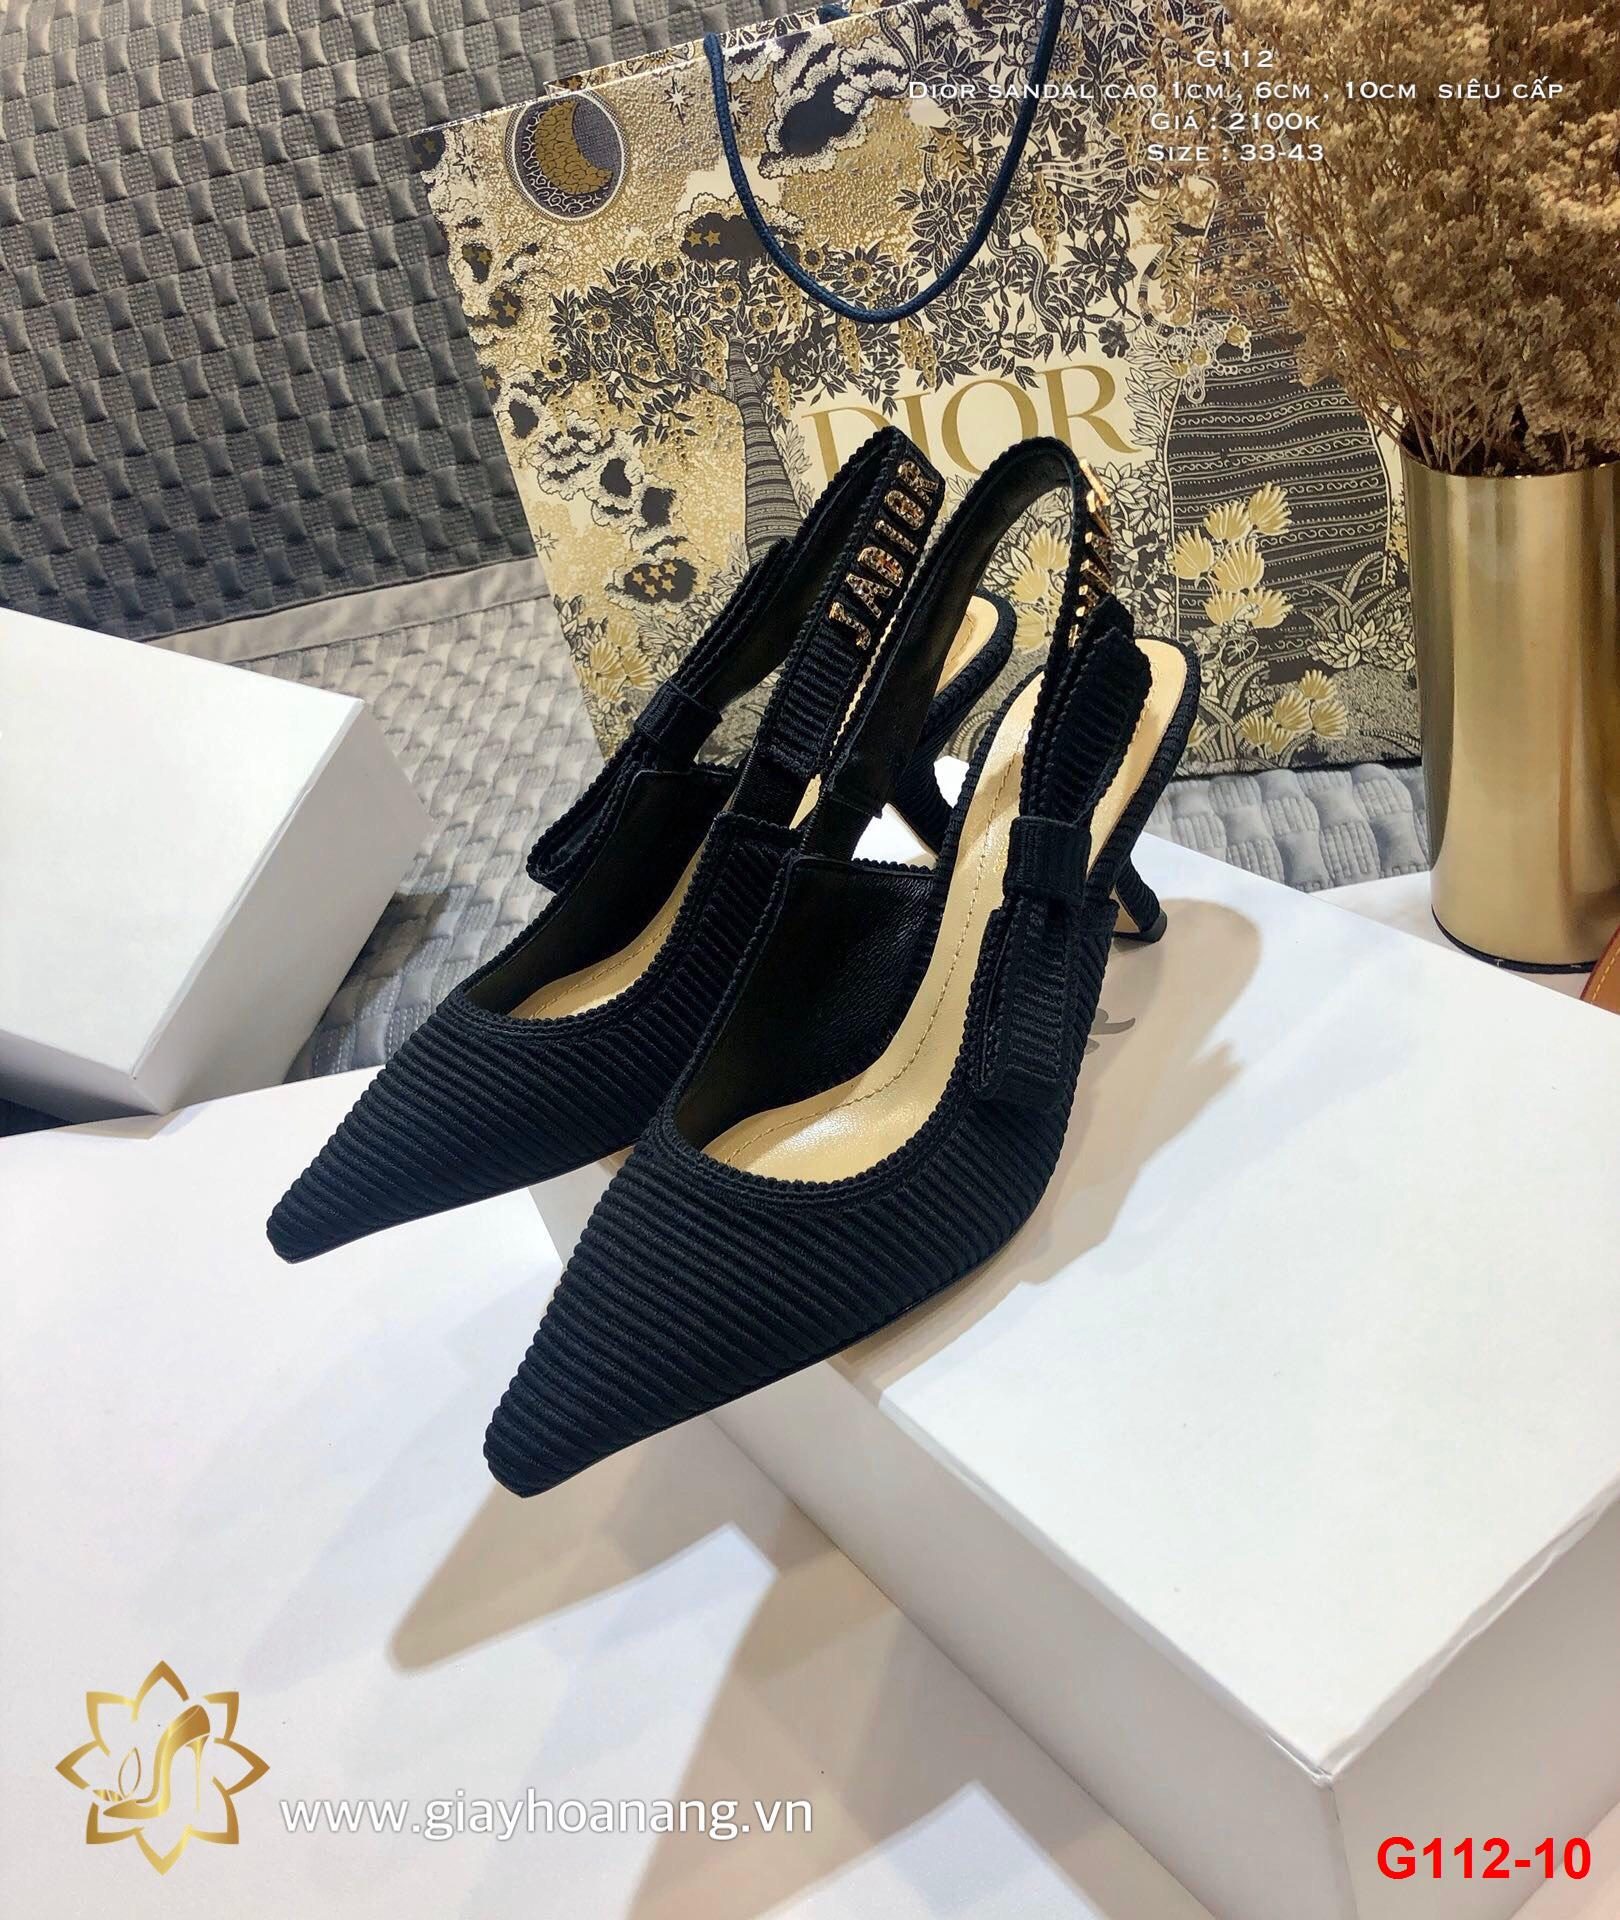 G112-10 Dior sandal cao 1cm , 6cm , 10cm  siêu cấp